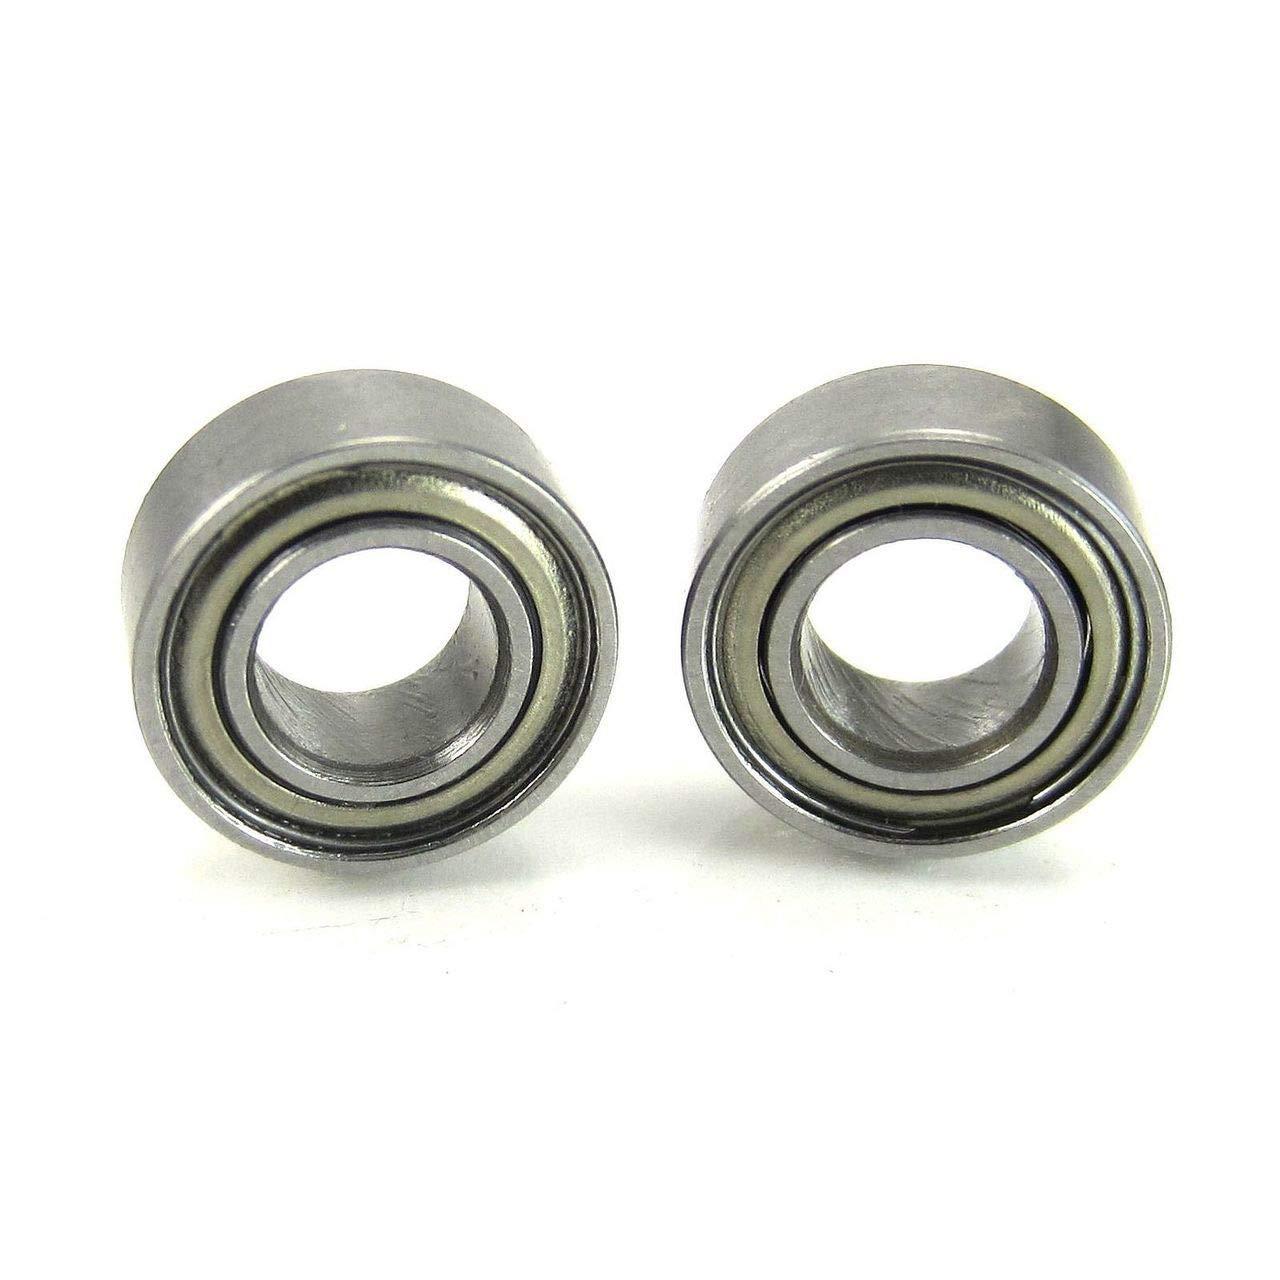 5x10x4mm Hybrid Ceramic Clutch Ball Bearings Metal Shields (2)